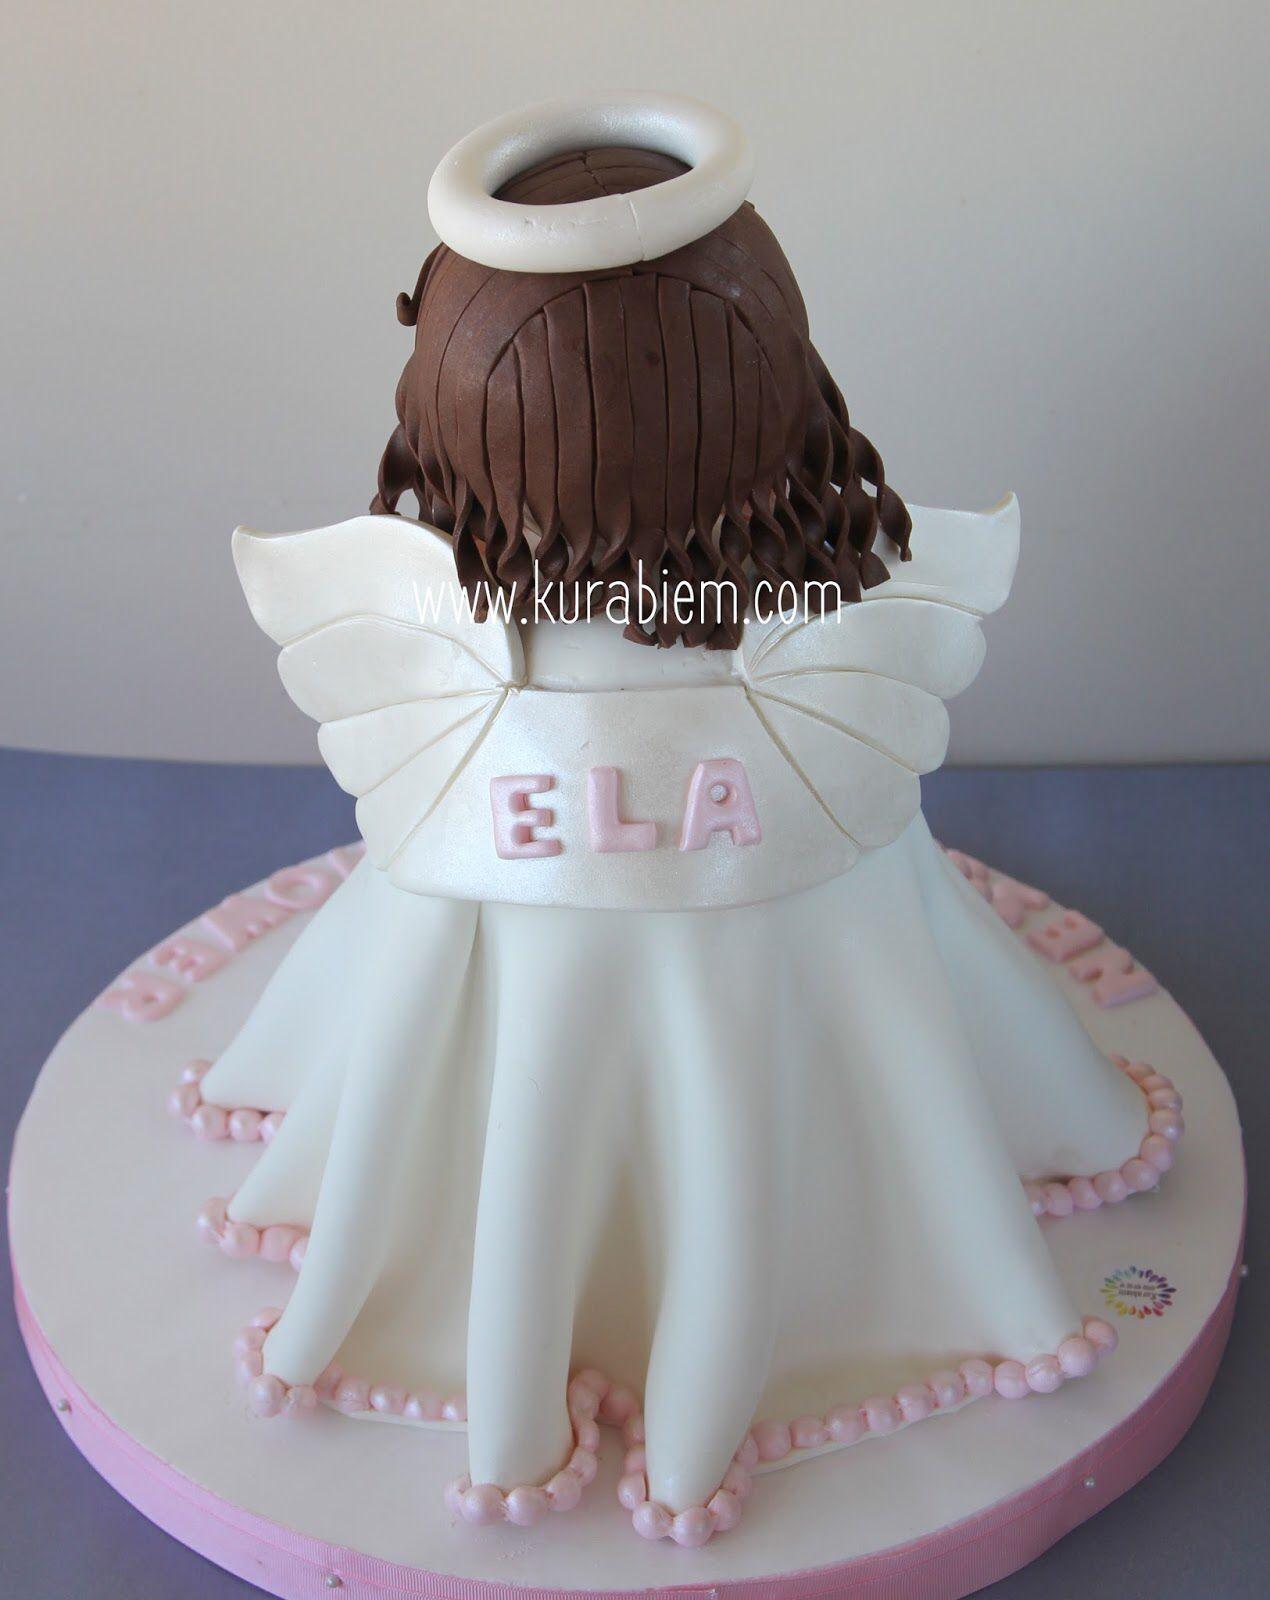 Angel cake 3d angel cake melek pasta babyshower pastası